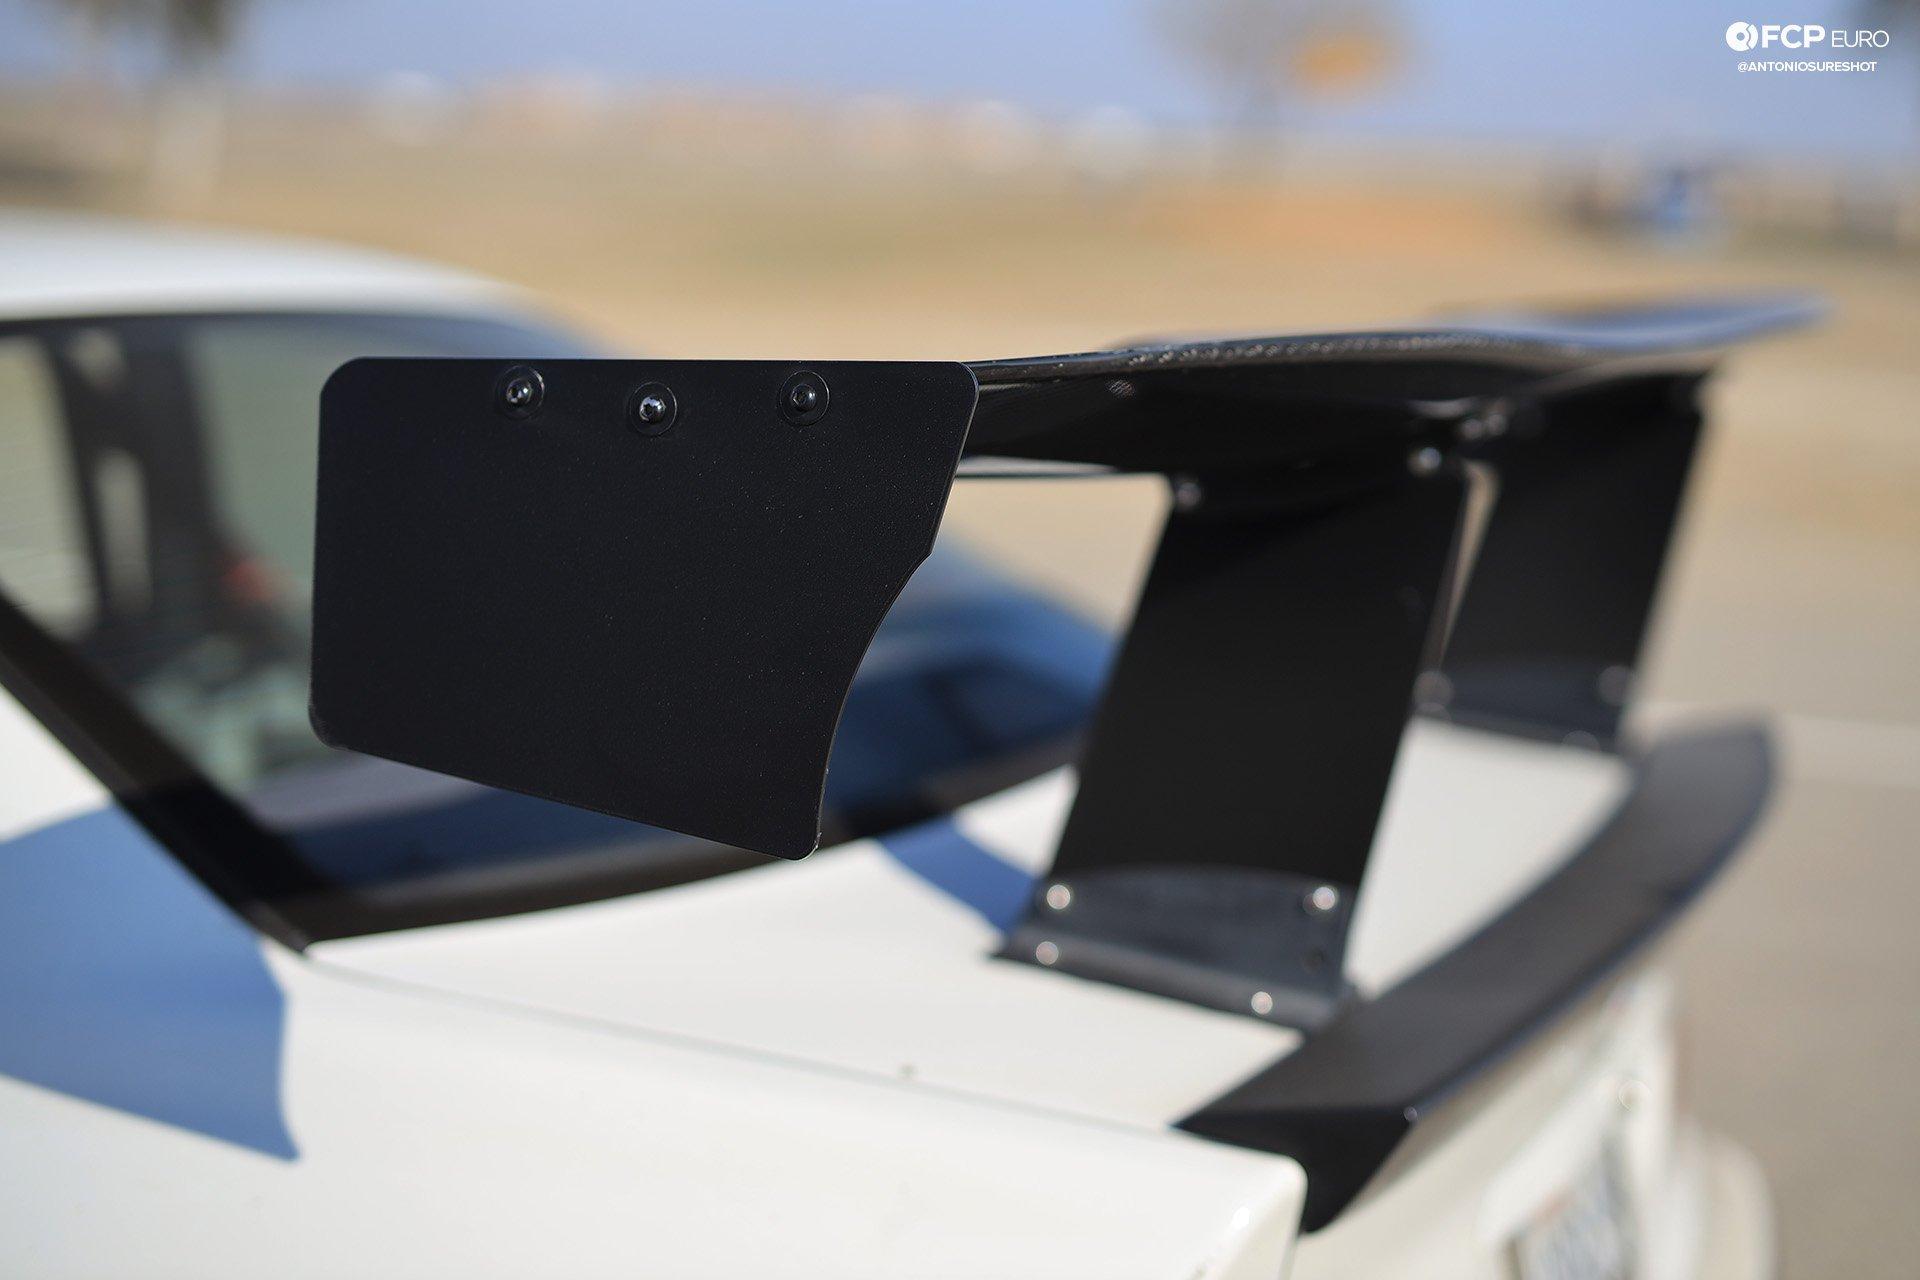 Motorsport Hardware BMW E36 M3 EOSR3633